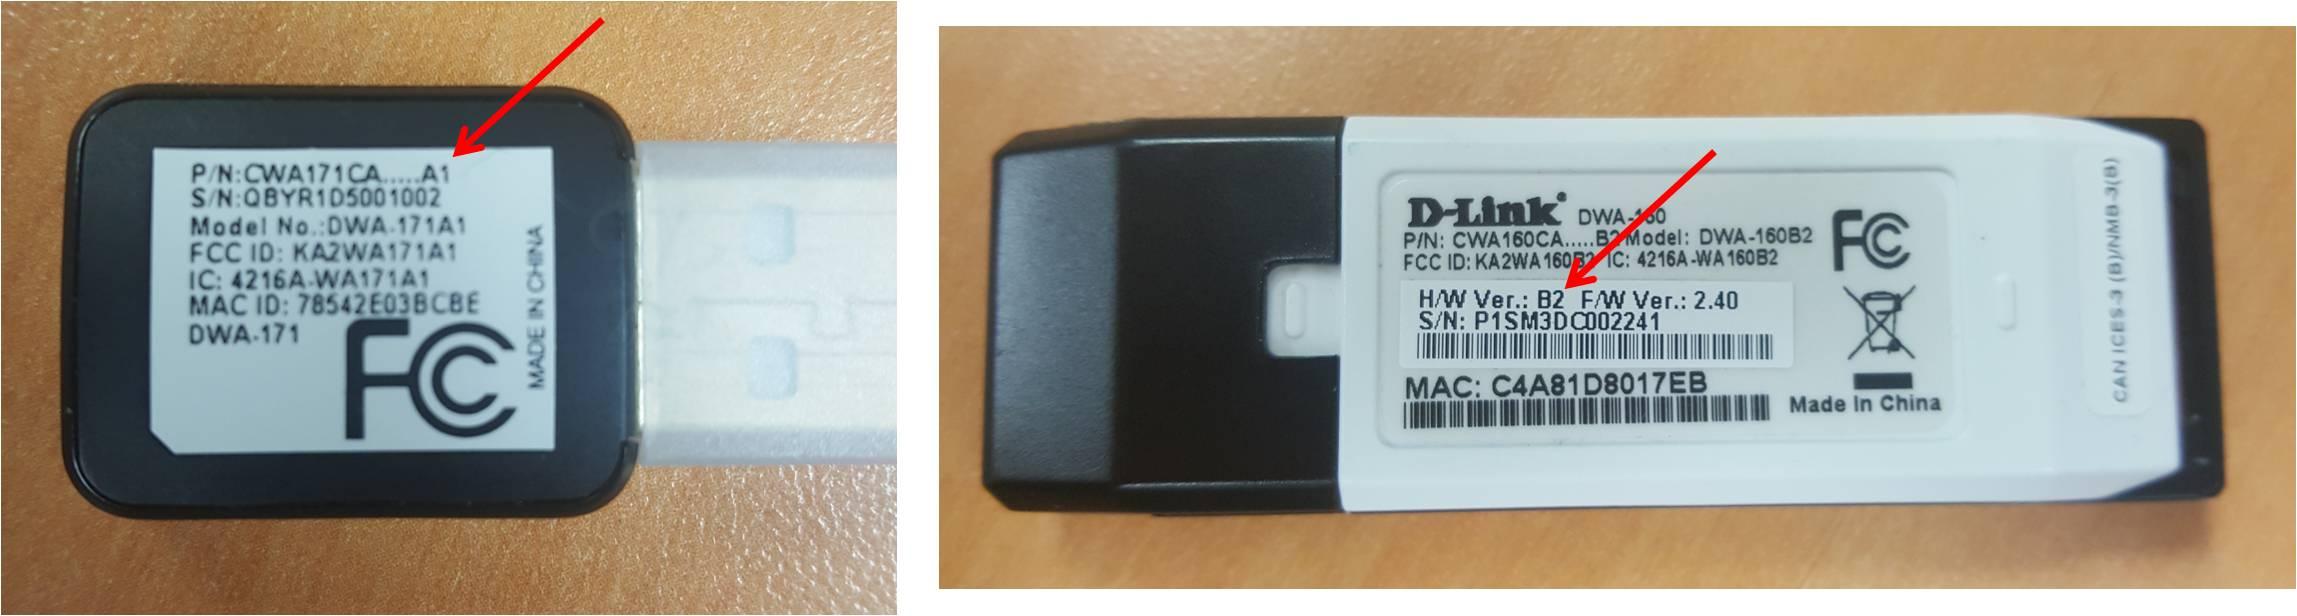 D-link dwa-130 wireless n usb adapter driver